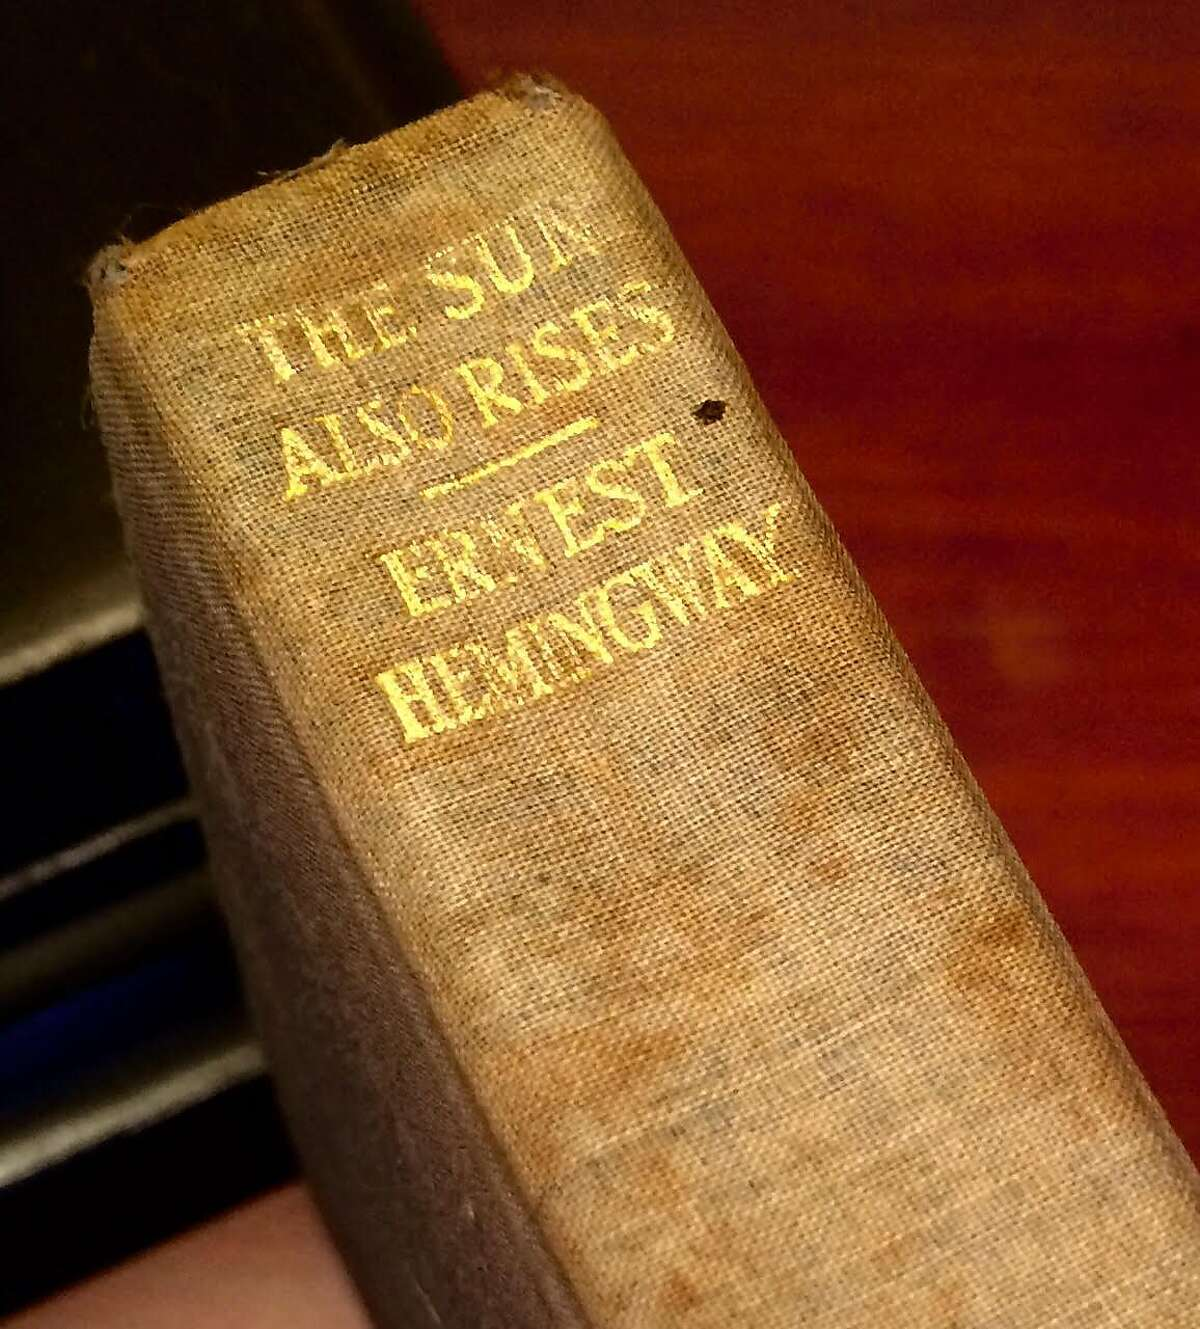 Lori Fogarty's 1930 edition of�